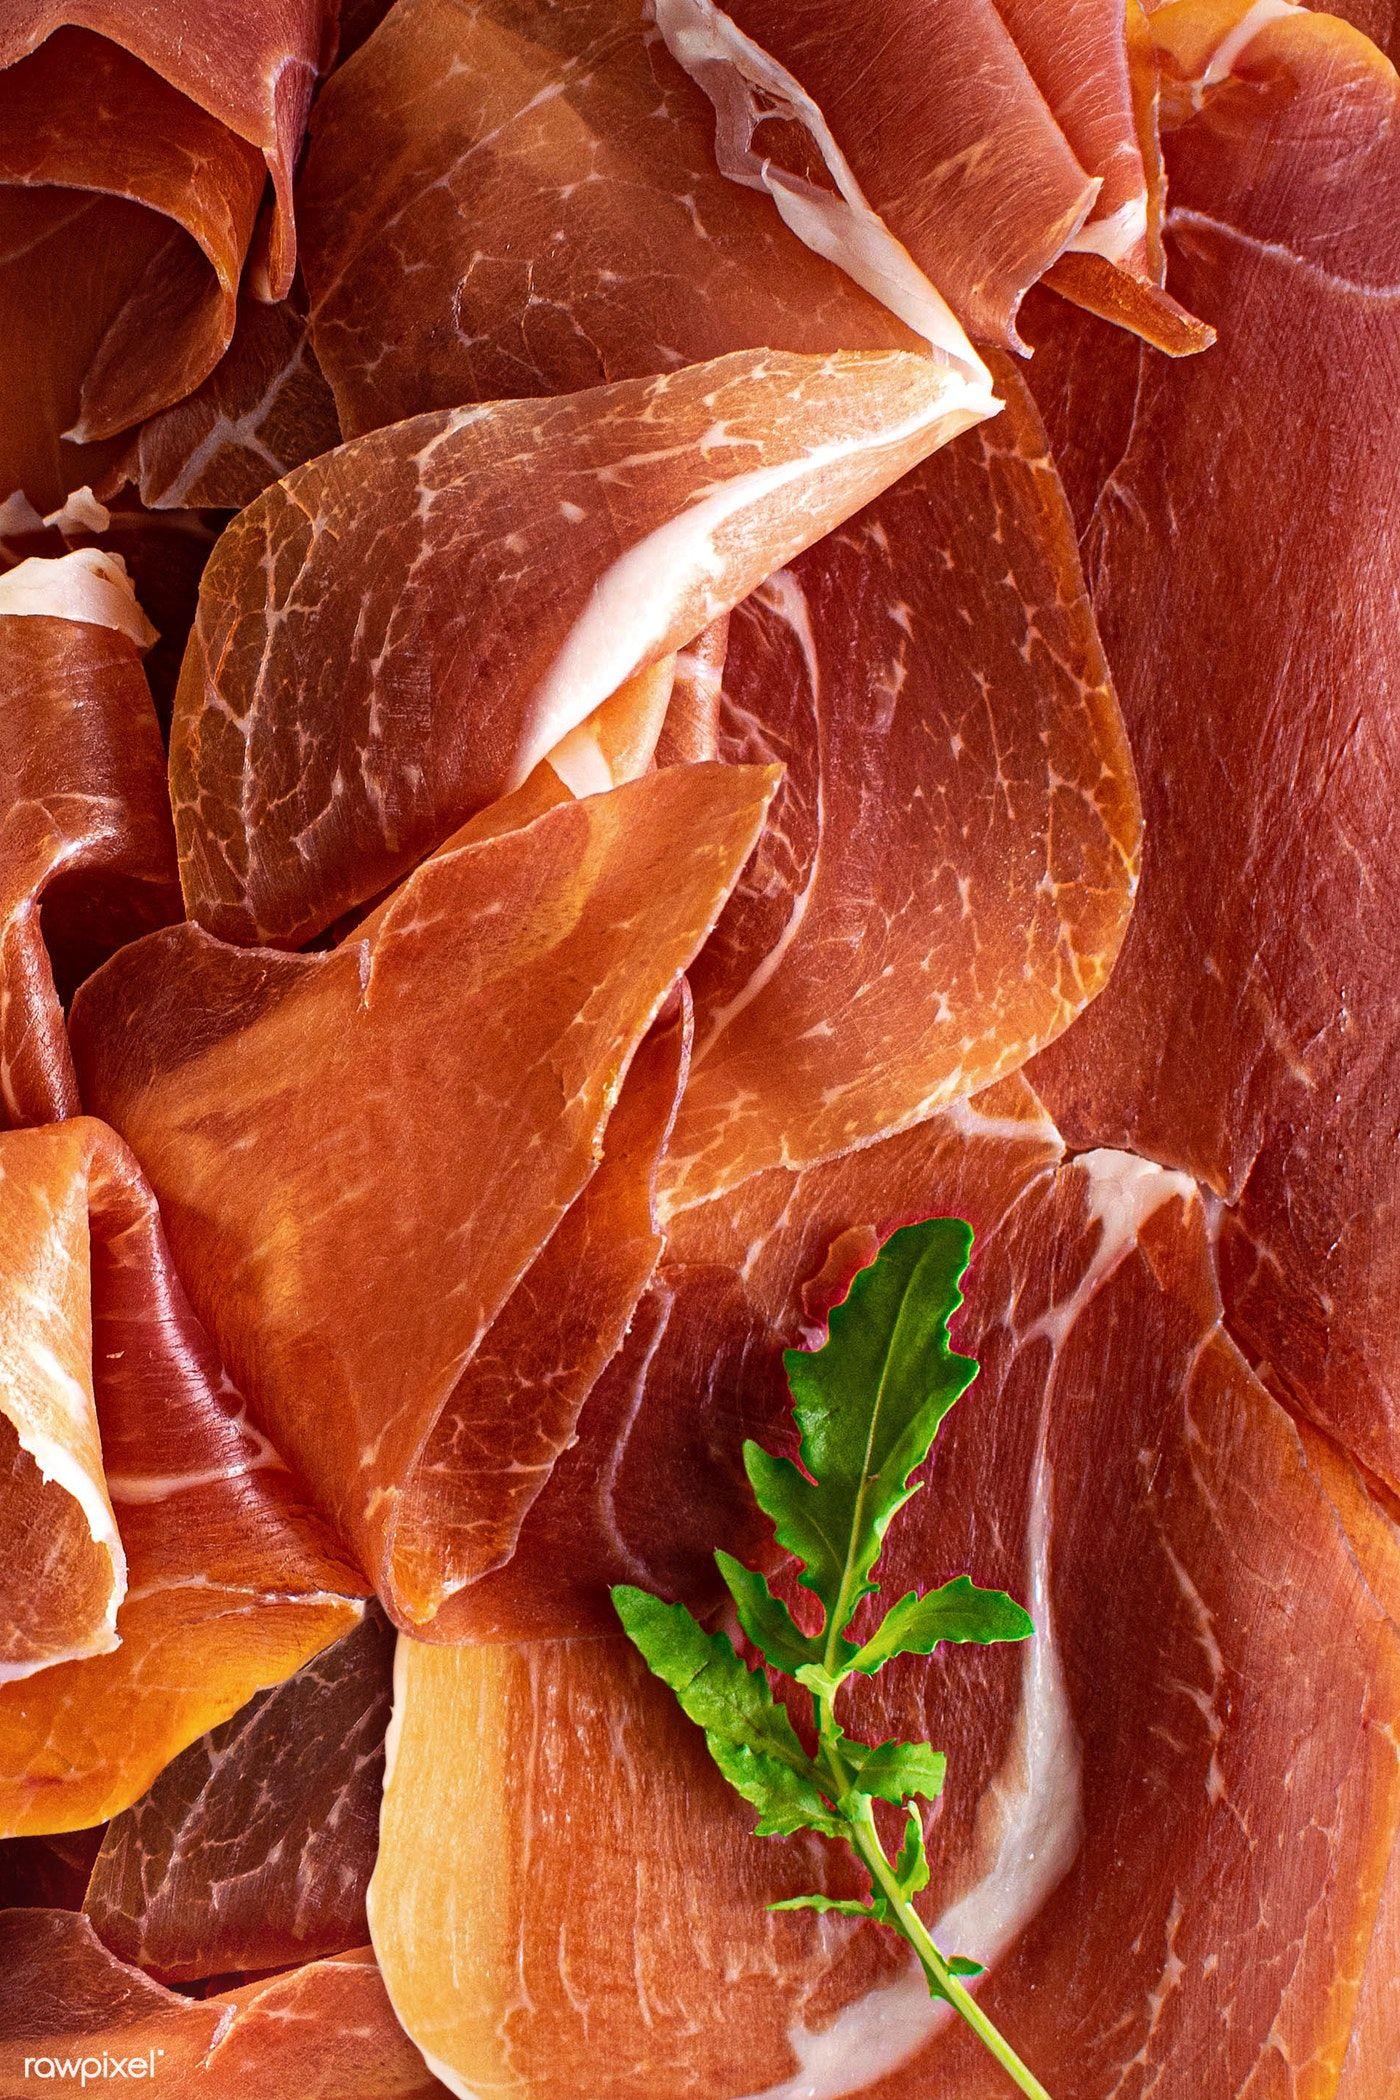 Italian Prosciutto Crudo Or Parma Ham Flatlay Free Image By Rawpixel Com Monika Italian Prosciutto Parma Ham Prosciutto